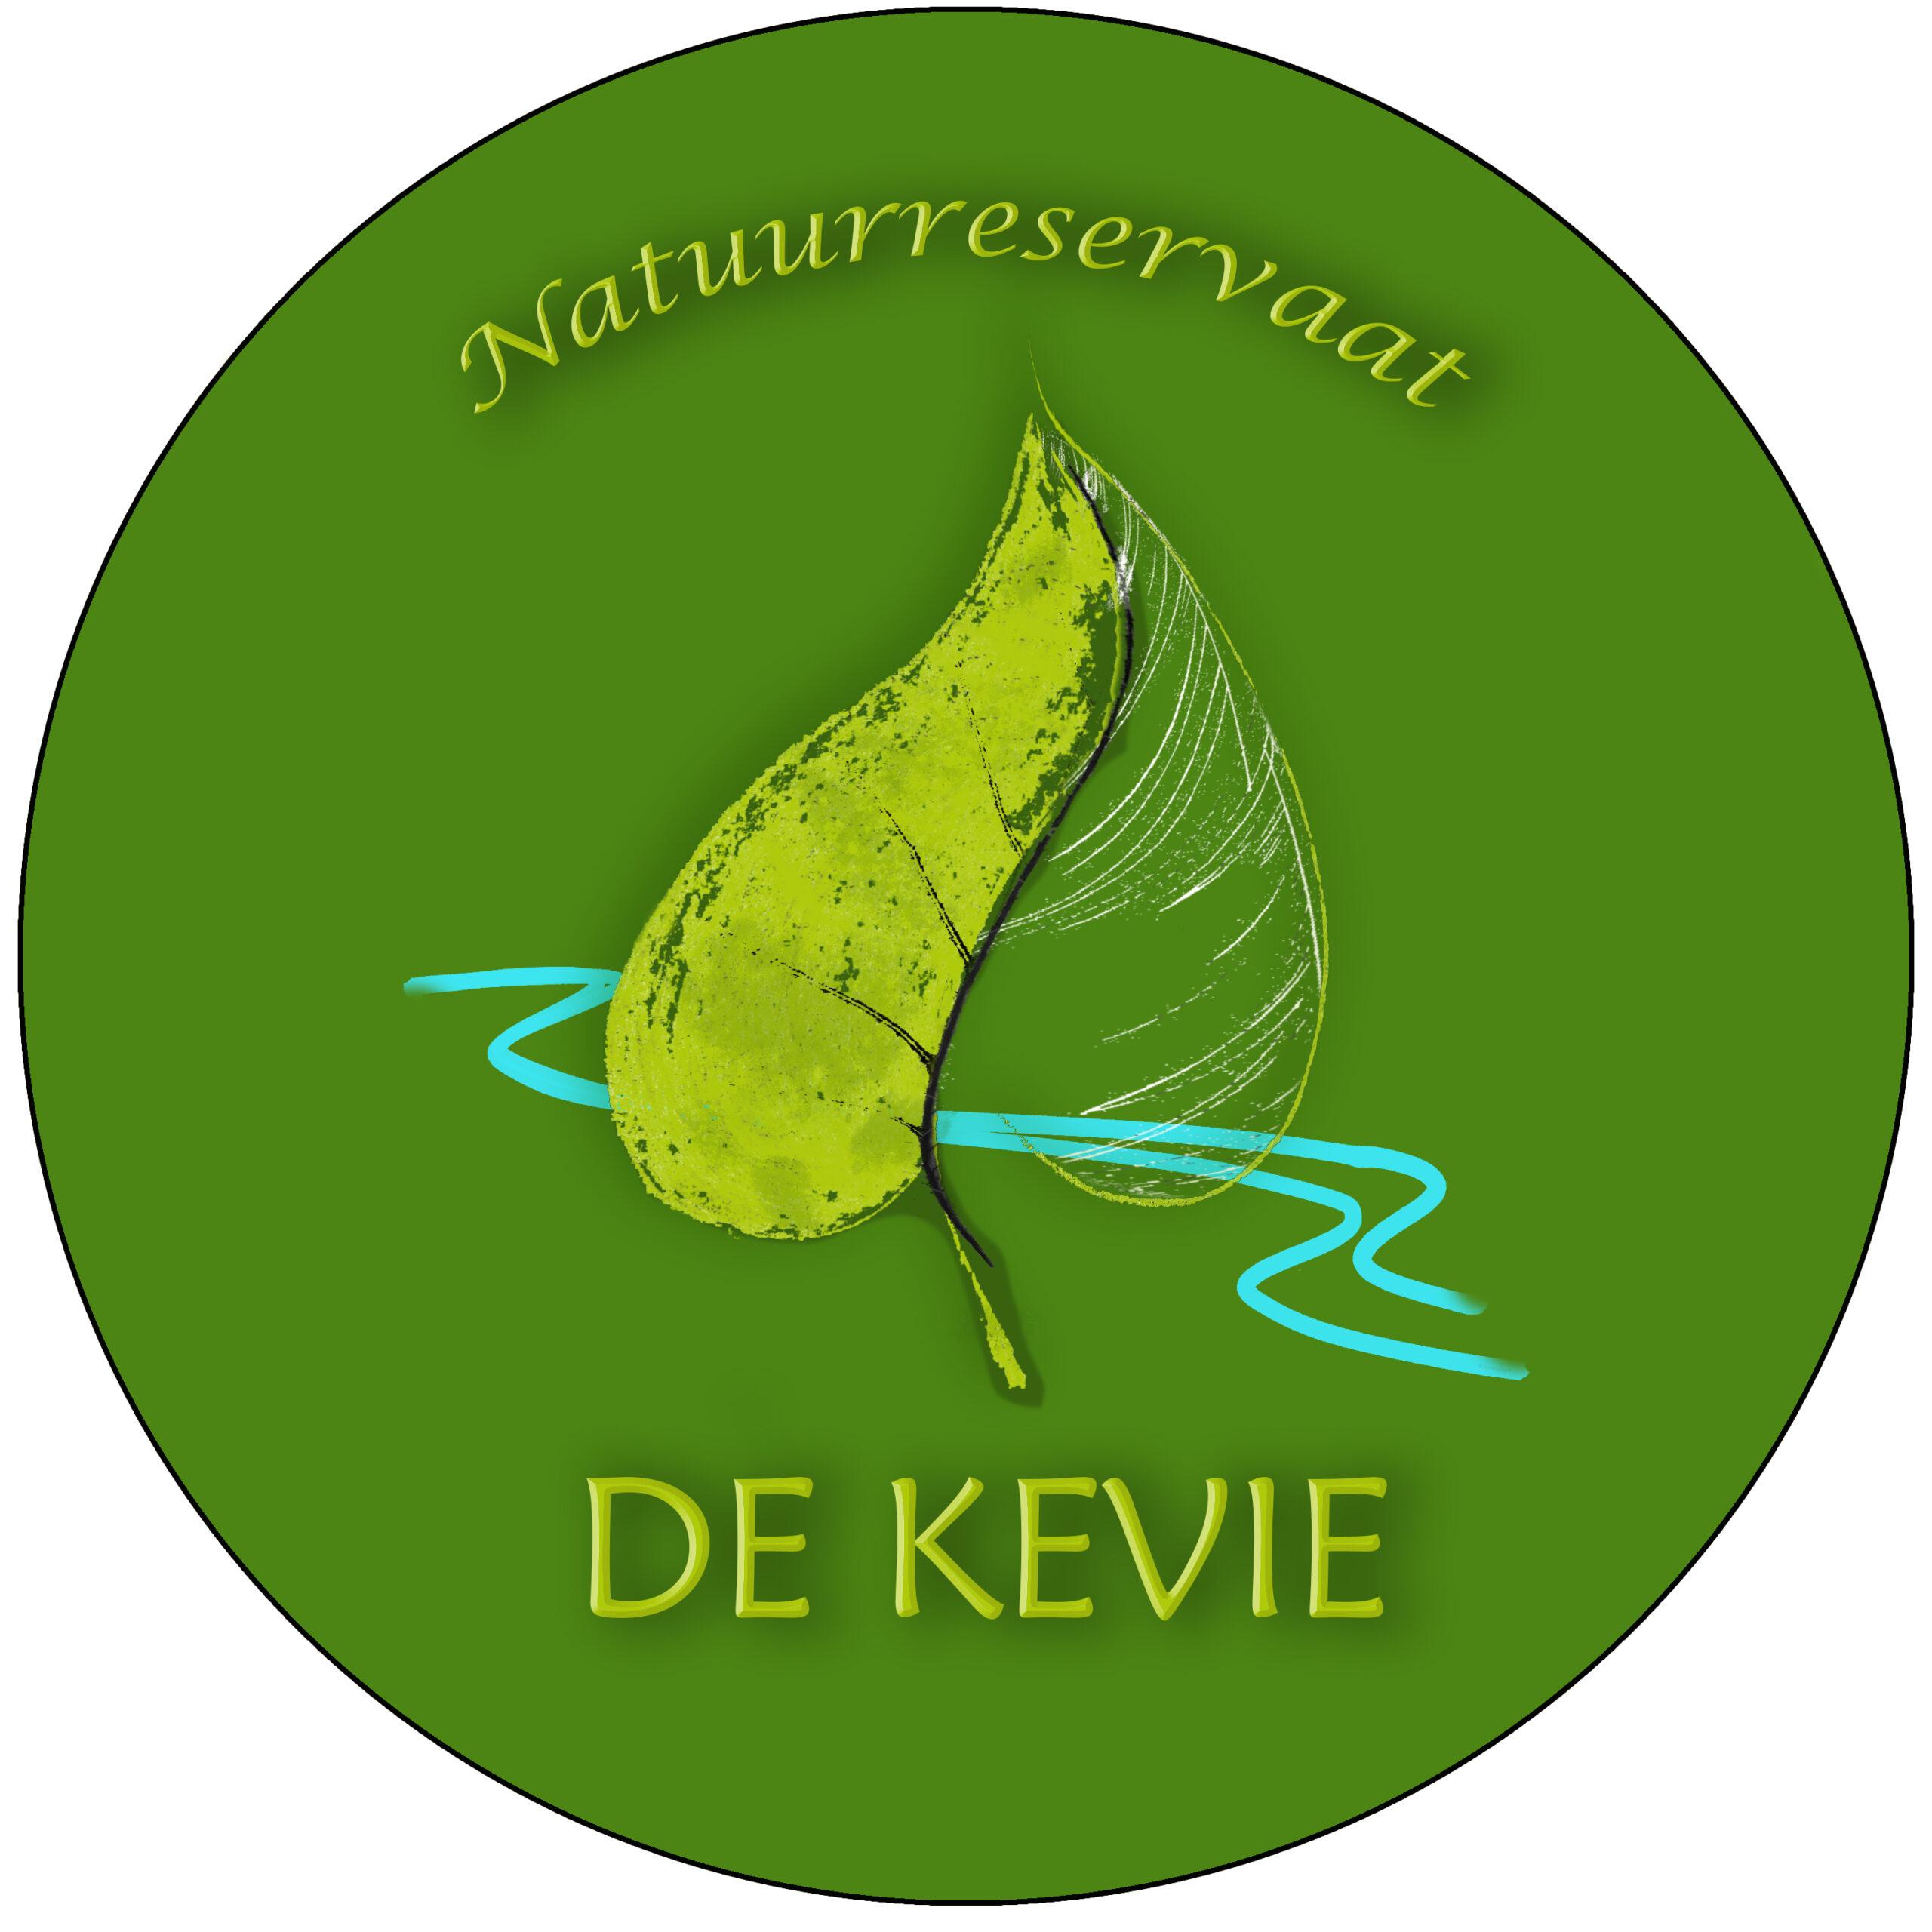 De Kevie | Tongeren